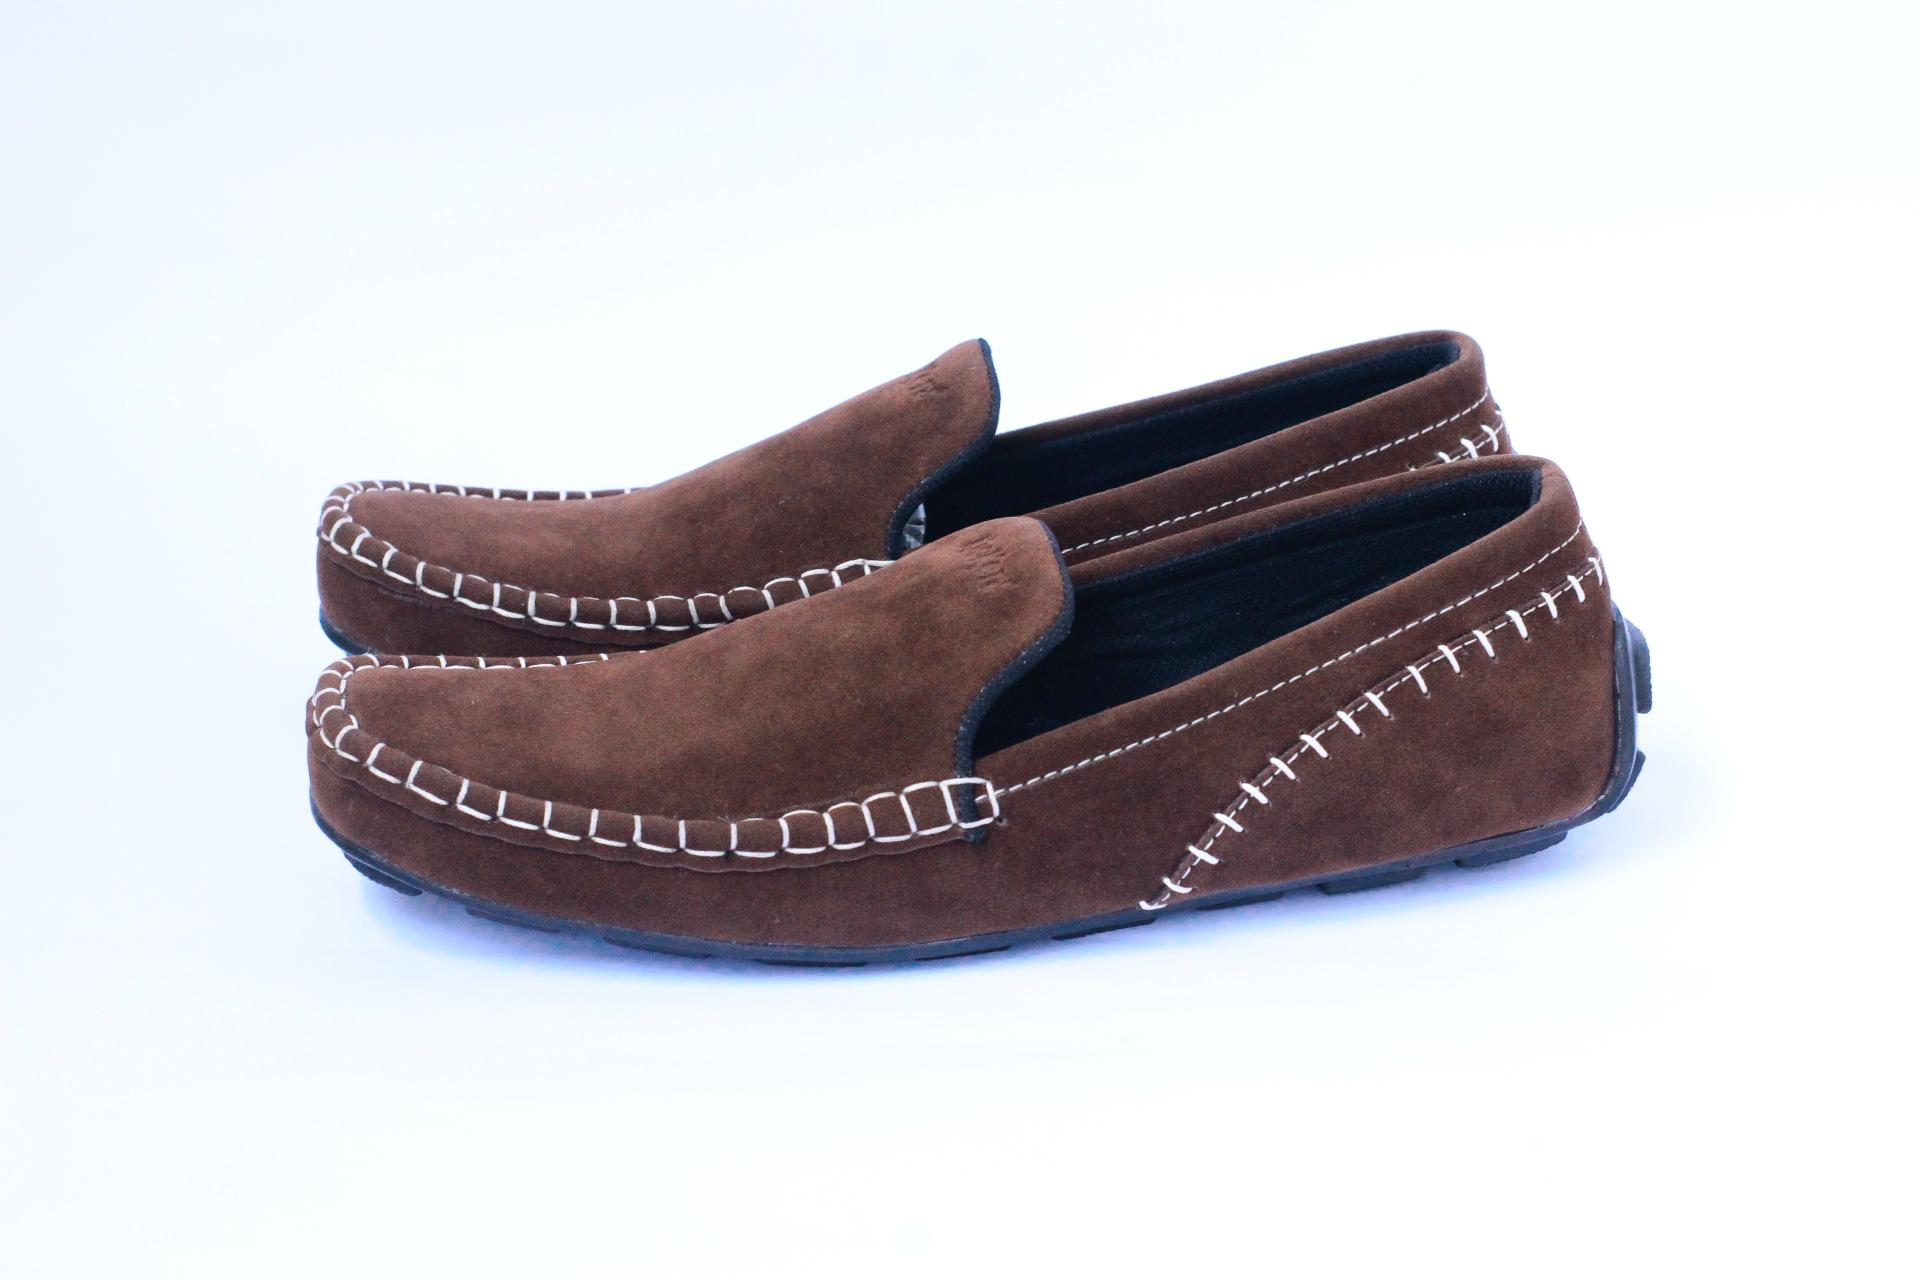 Sepatu casual pria slop loafers rajut kulit suede santai slip on ( LOKAL)  semi formal f193b9cae7